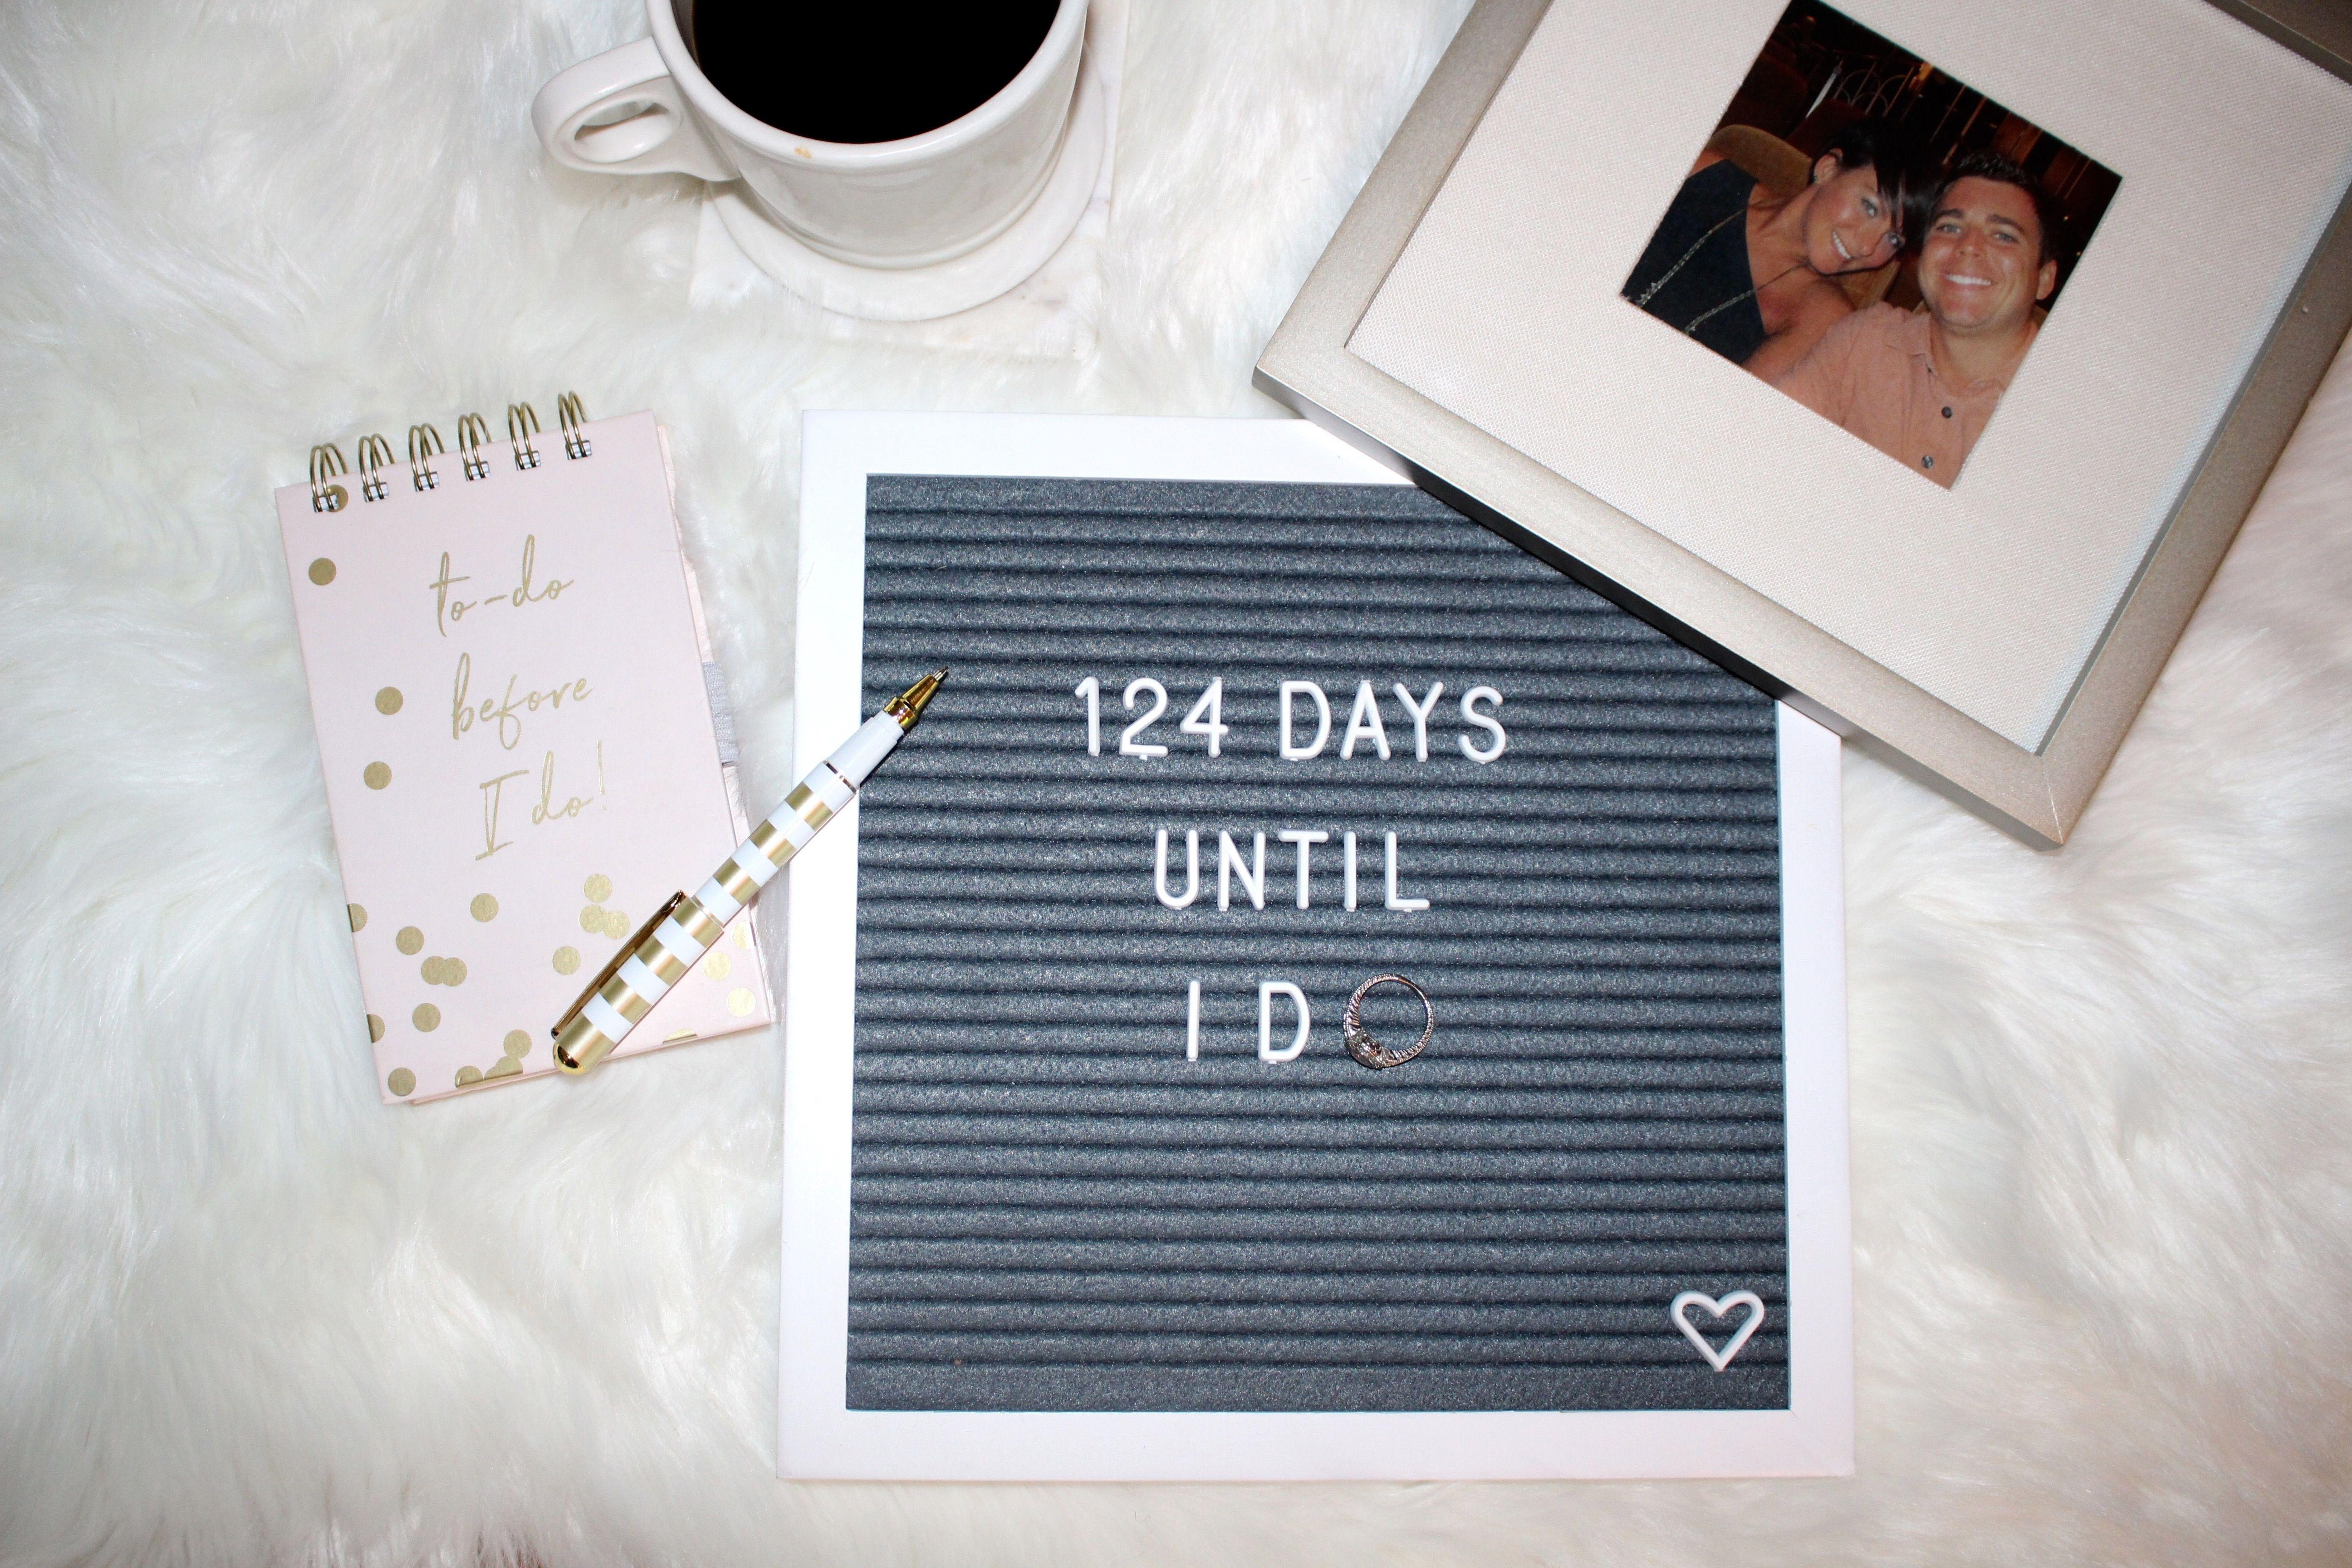 Park Creations 10x10 White Frame Letter Board With Gray Felt Framed Letters Wedding Letters Lettering